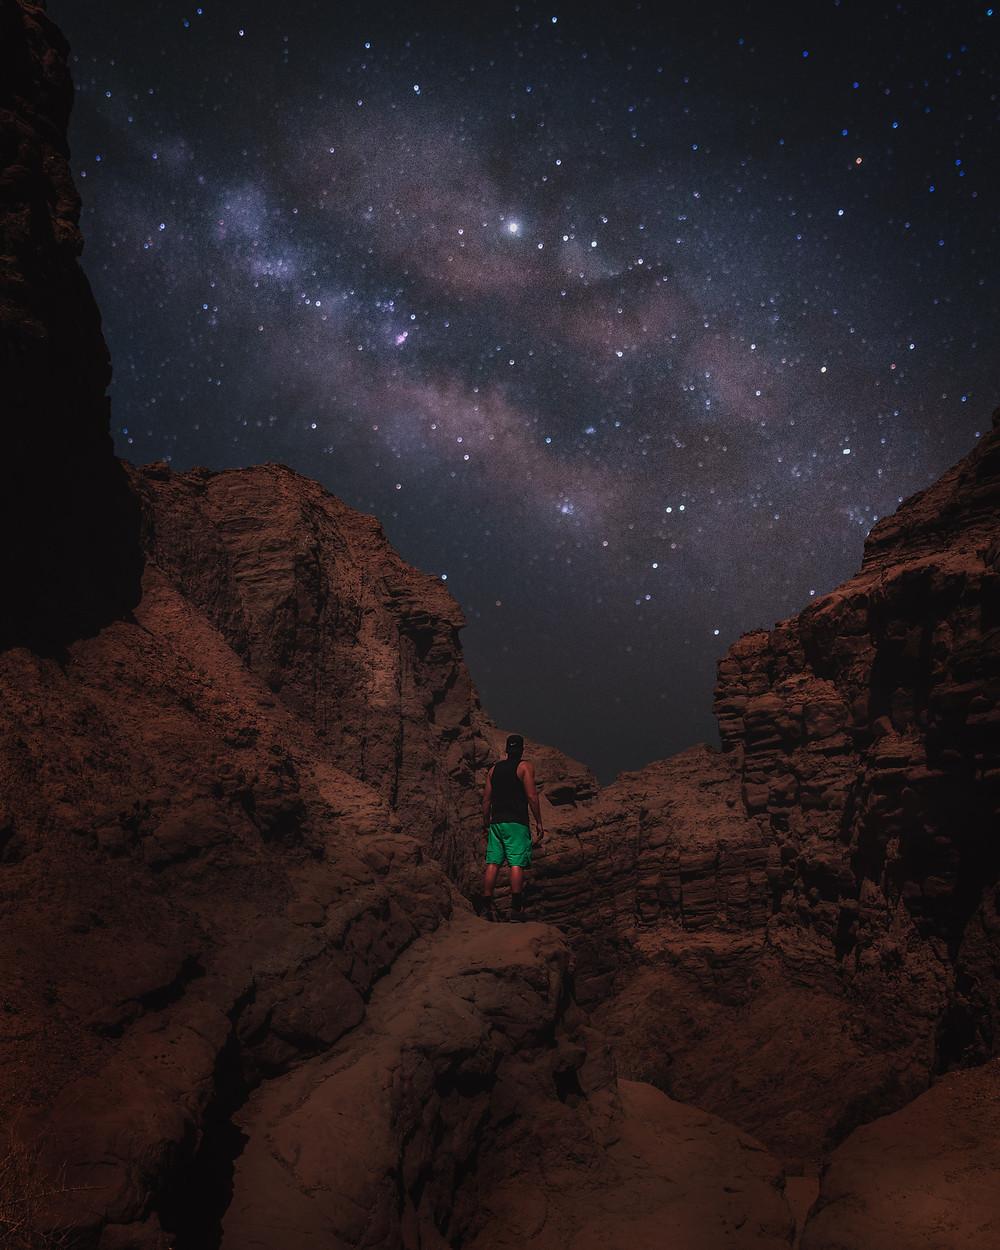 hiking under the Milky Way stars at night